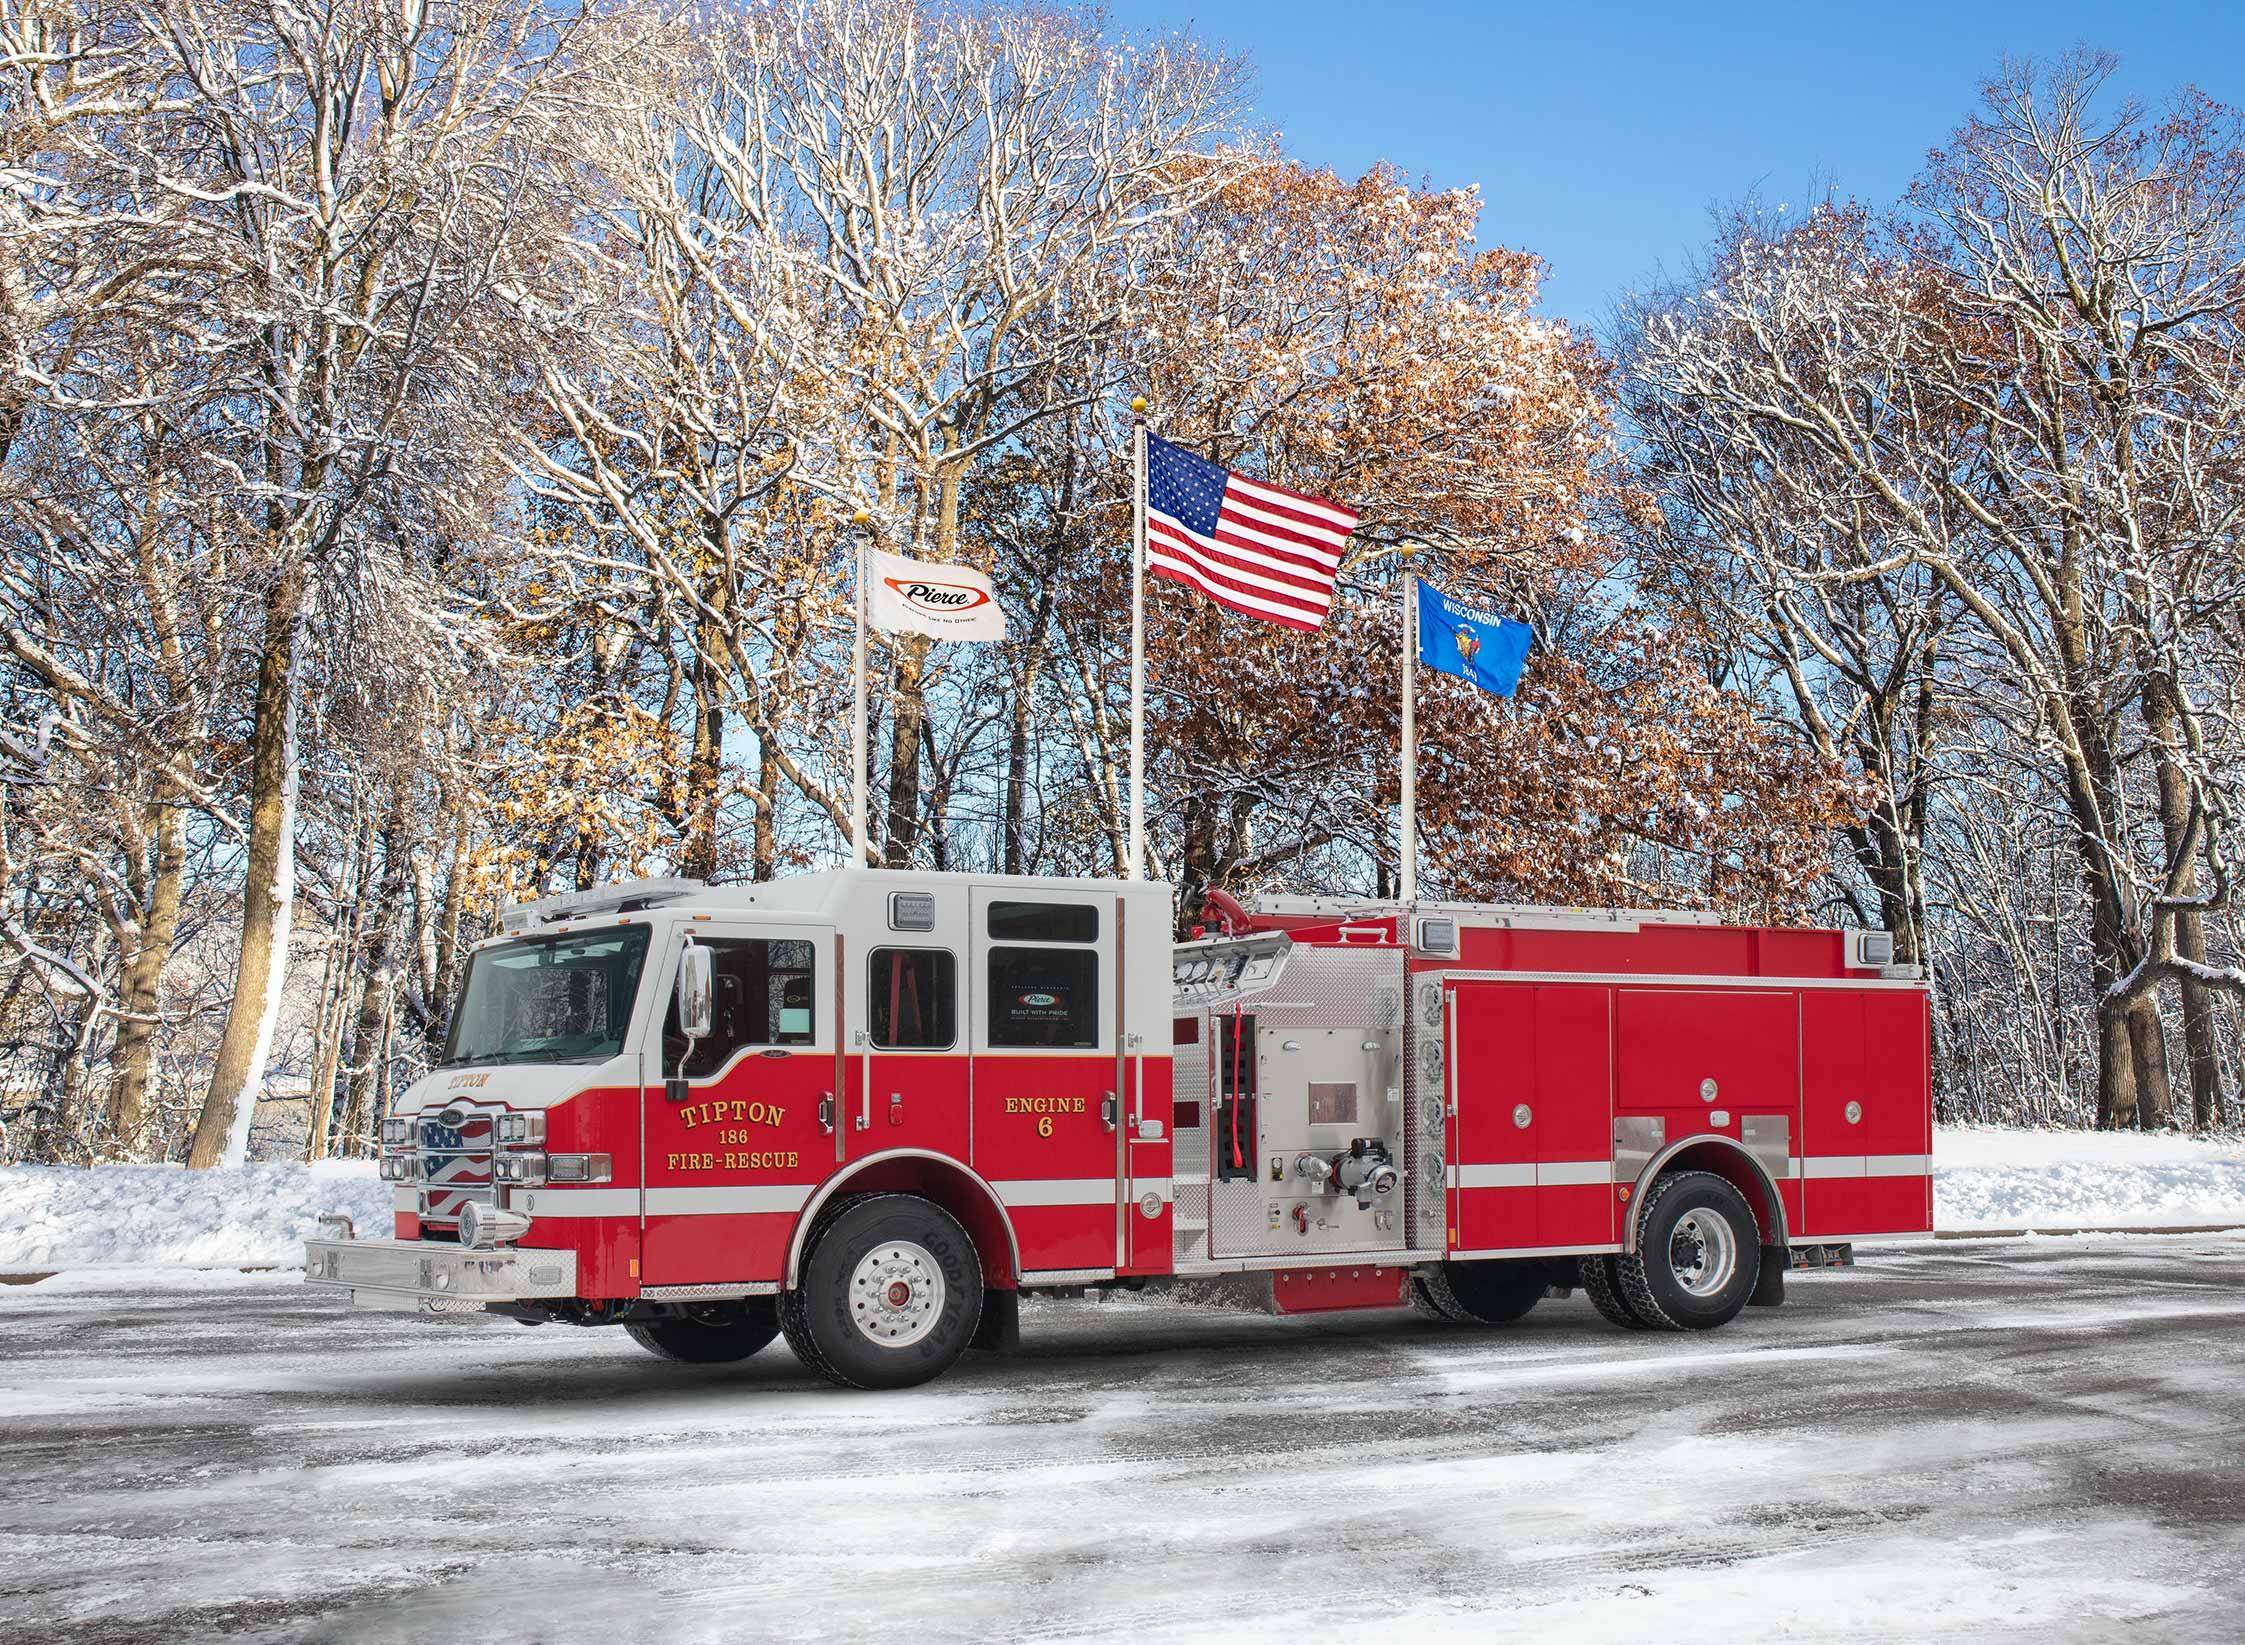 Tipton Fire Department - Pumper